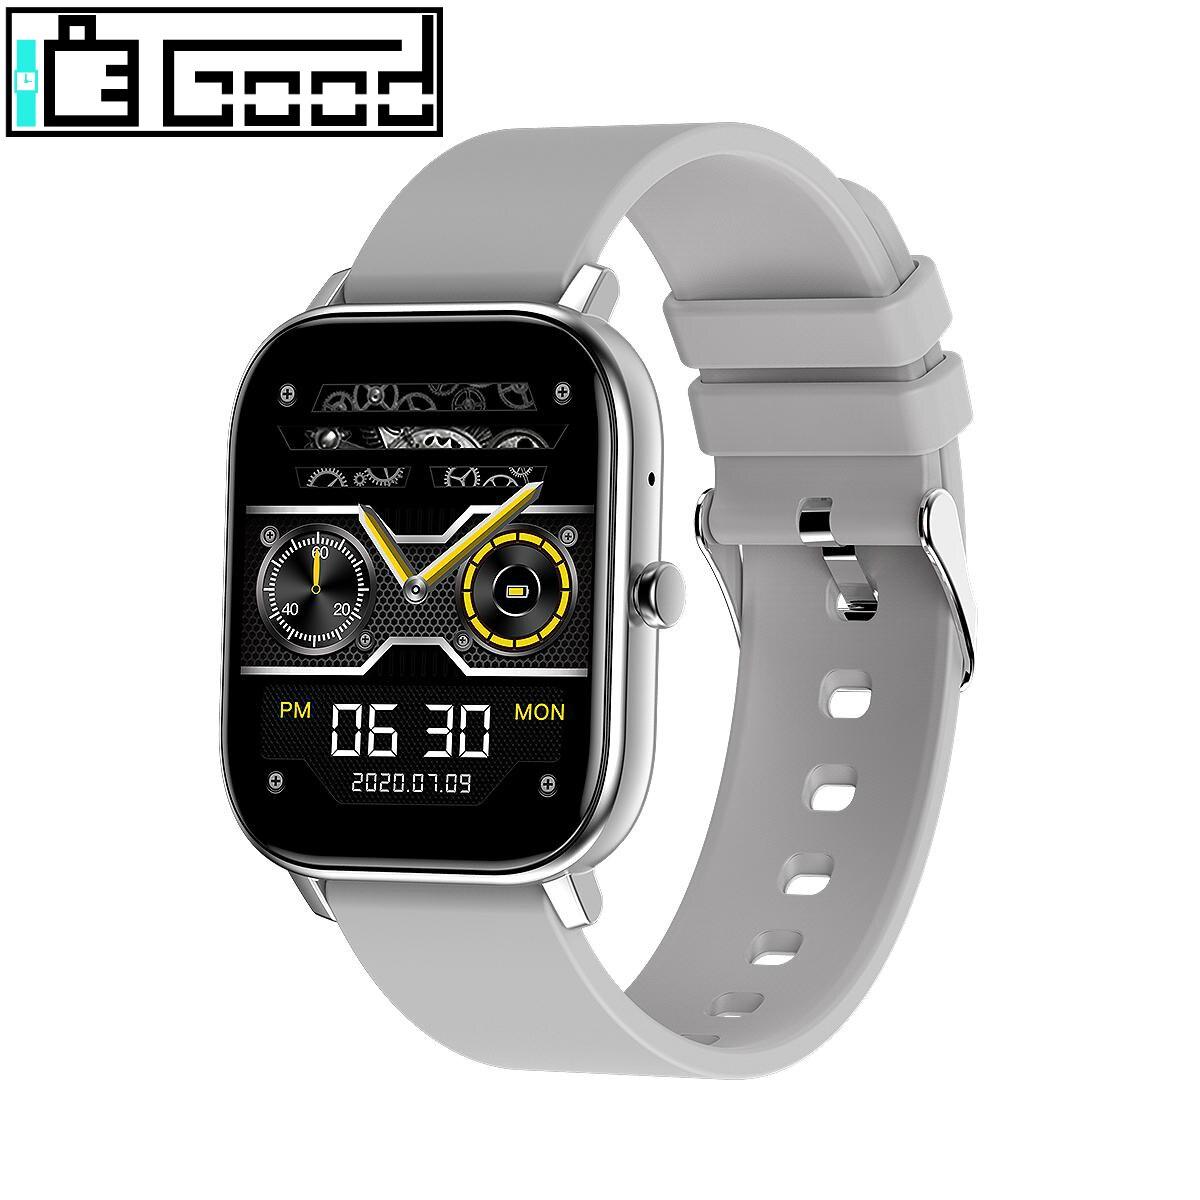 Reloj inteligente amazfit GTS GT 2 W26 ip67 para hombre, para OPPO, IOS, Android, xiaomi, huawei, PK, 2020